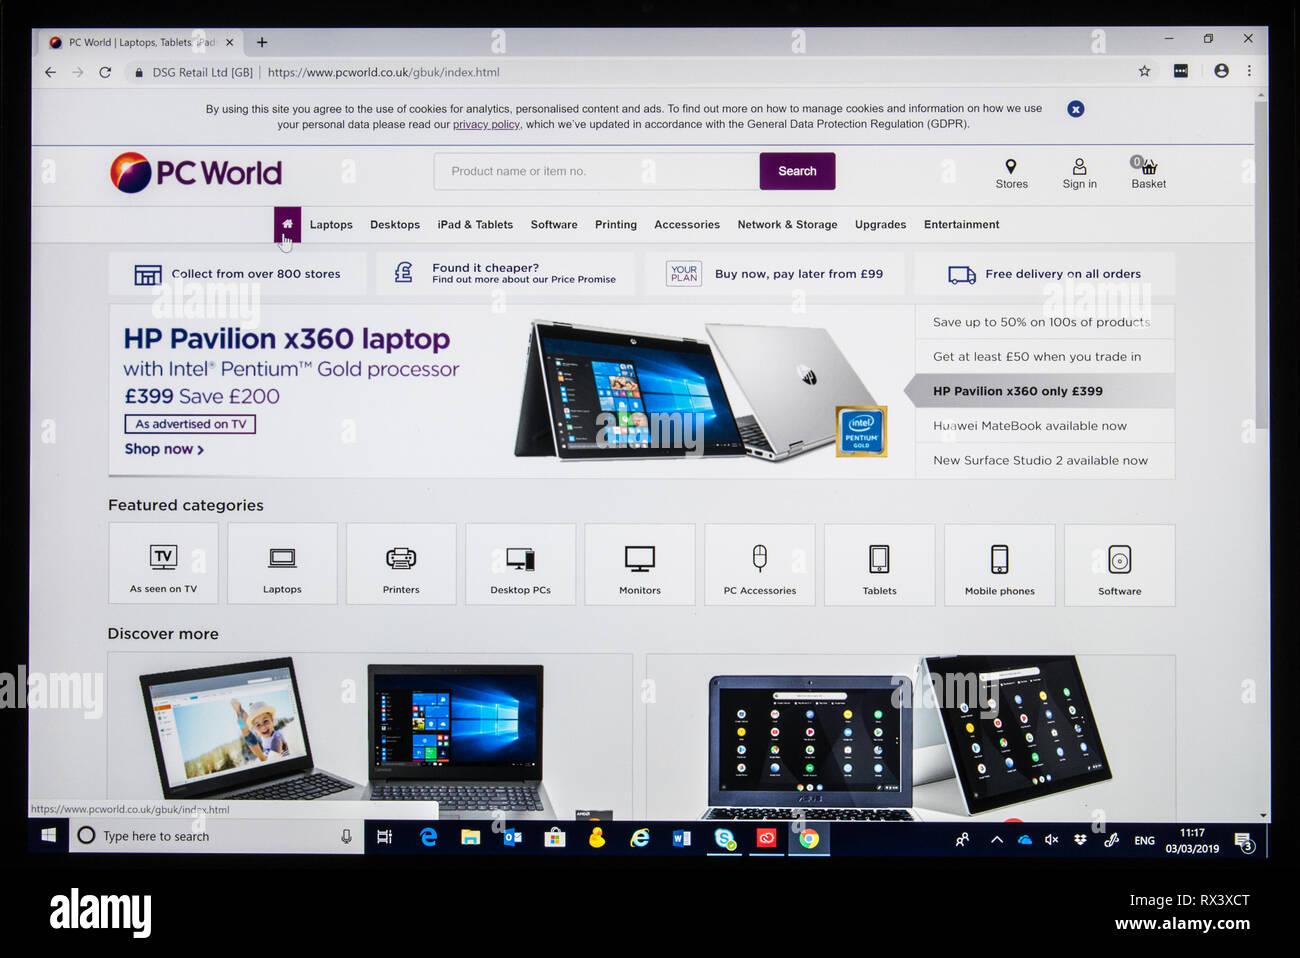 PC World online store screenshot showing laptops - Stock Image